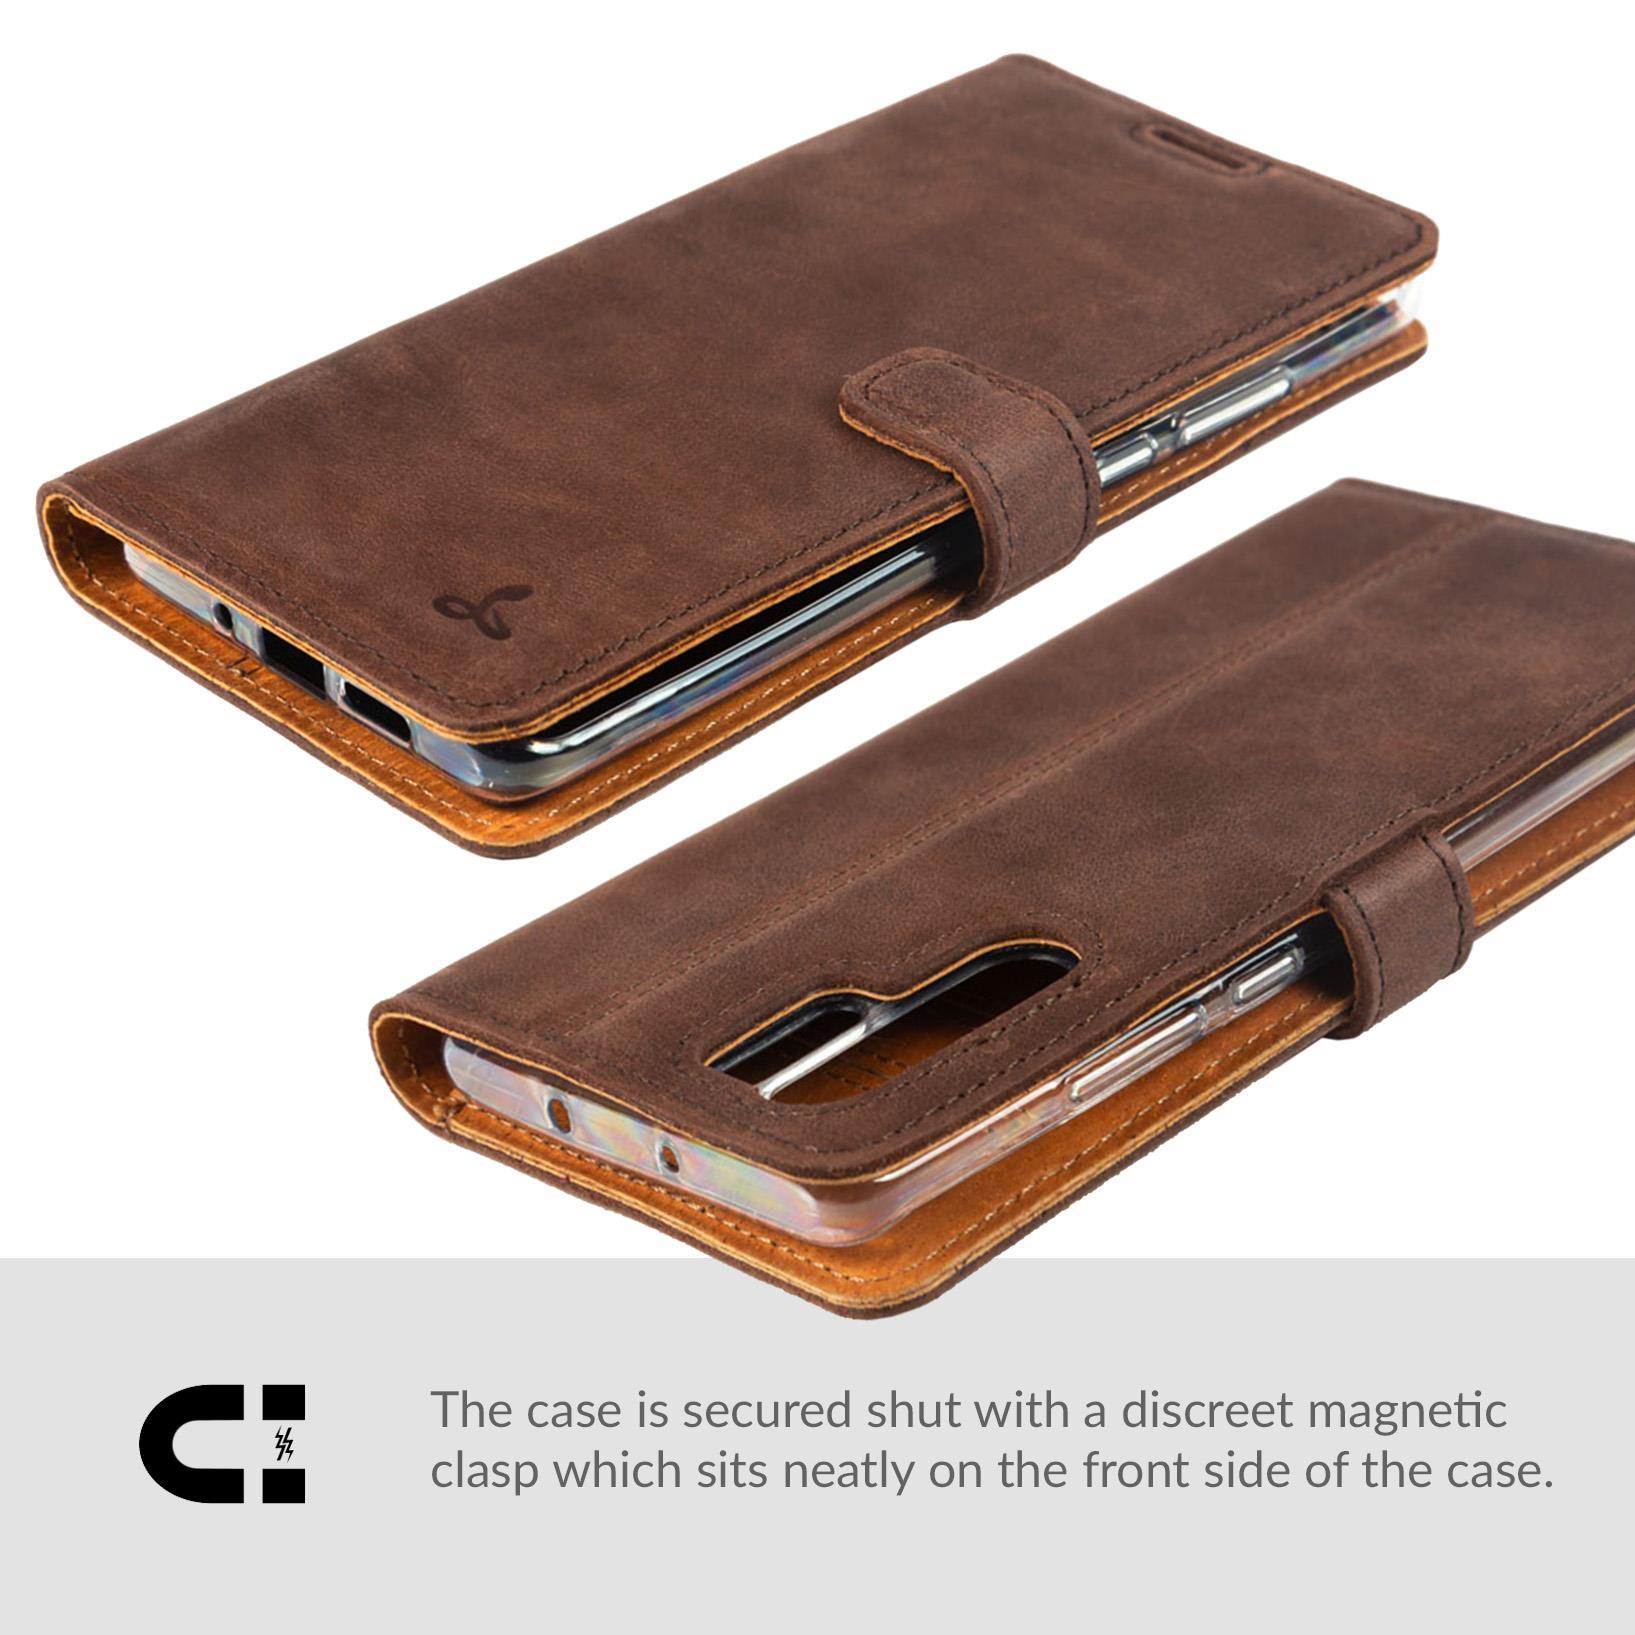 Snakehive-Huawei-P30-Pro-Premium-Genuine-Leather-Wallet-Case-w-Card-Slots thumbnail 8